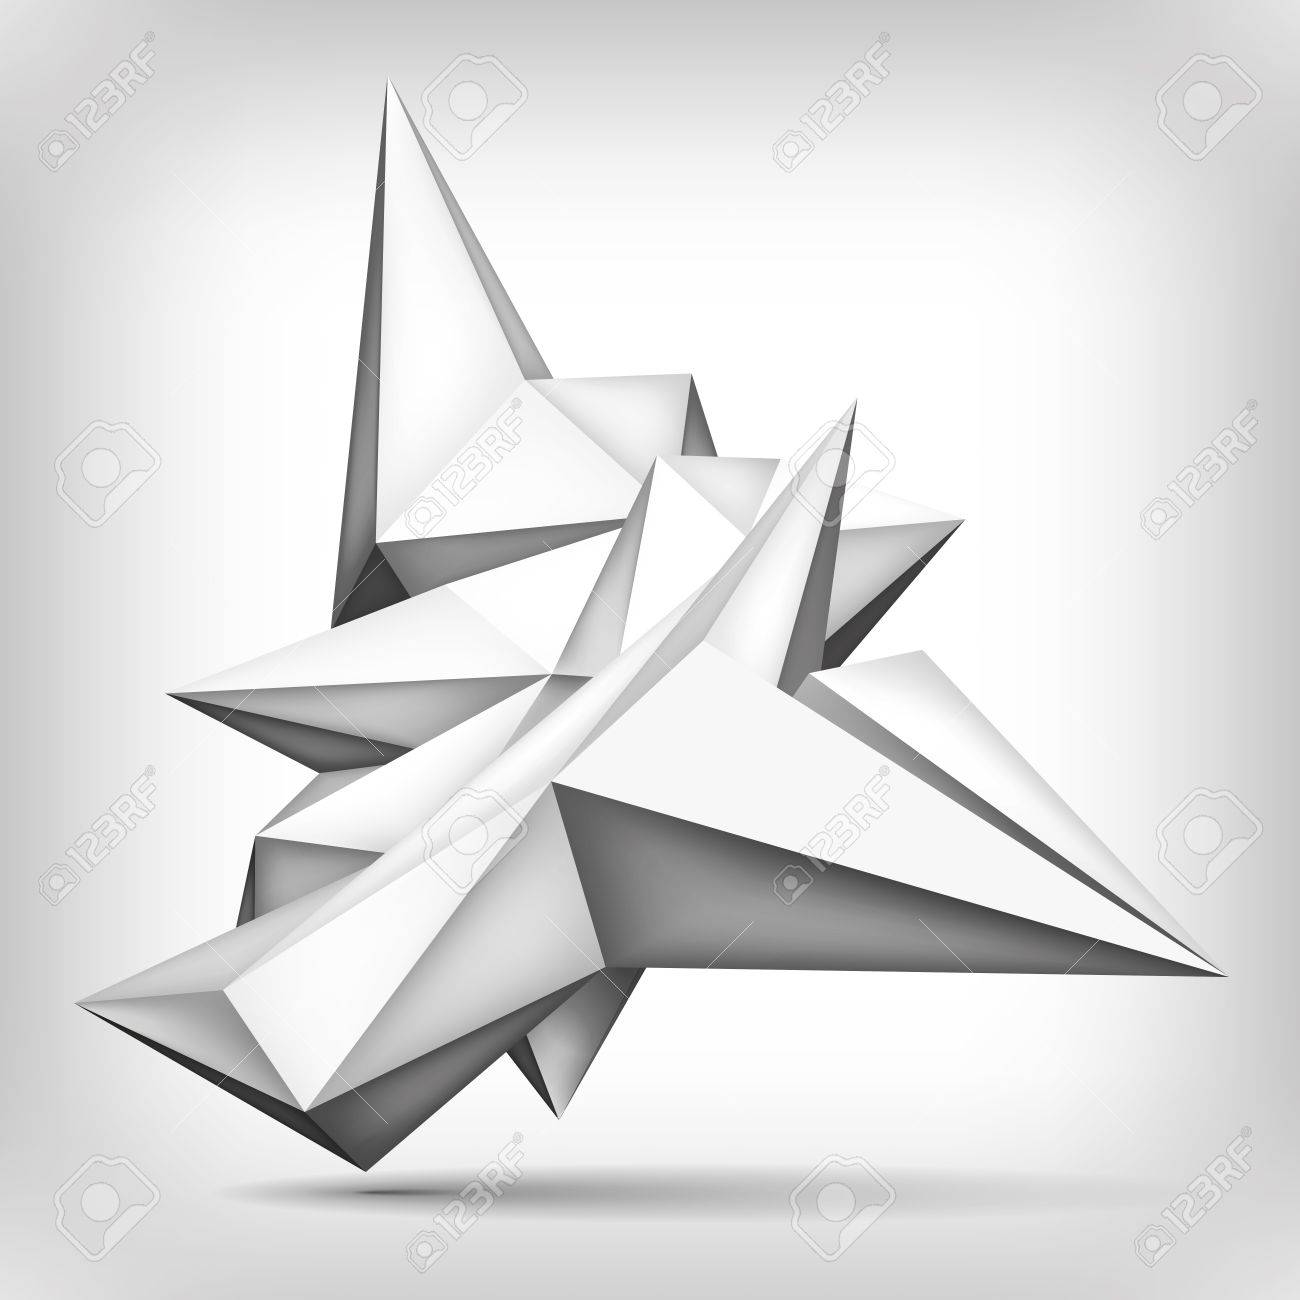 volume geometric shape, paper airplane, 3d crystal, creative